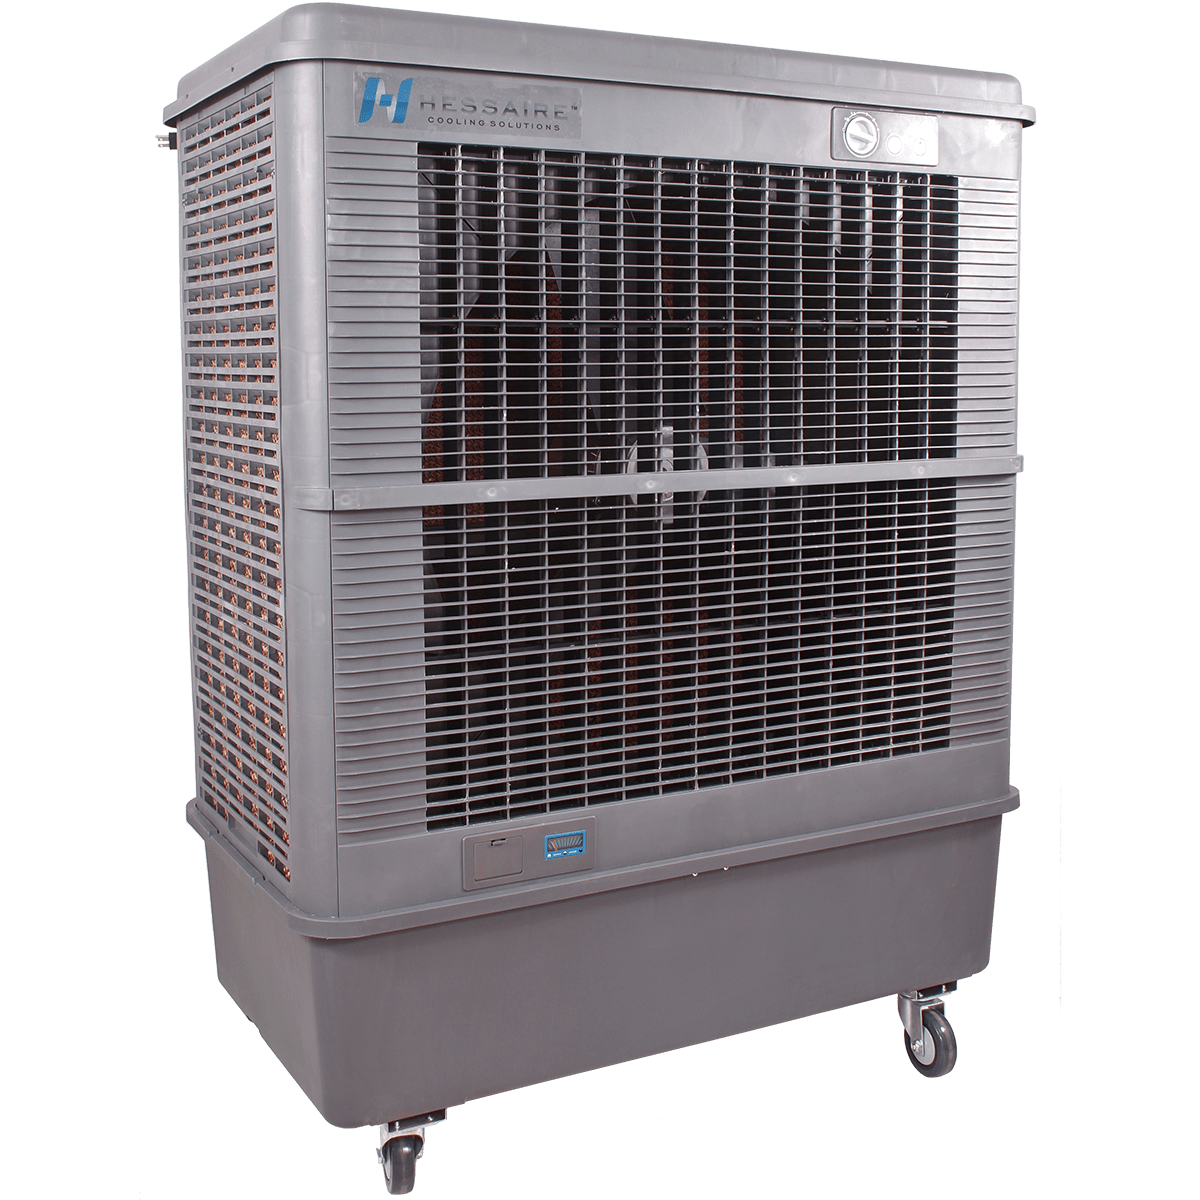 Hessaire MC91M 8,500 CFM 2-Speed Portable Evaporative Cooler he5455